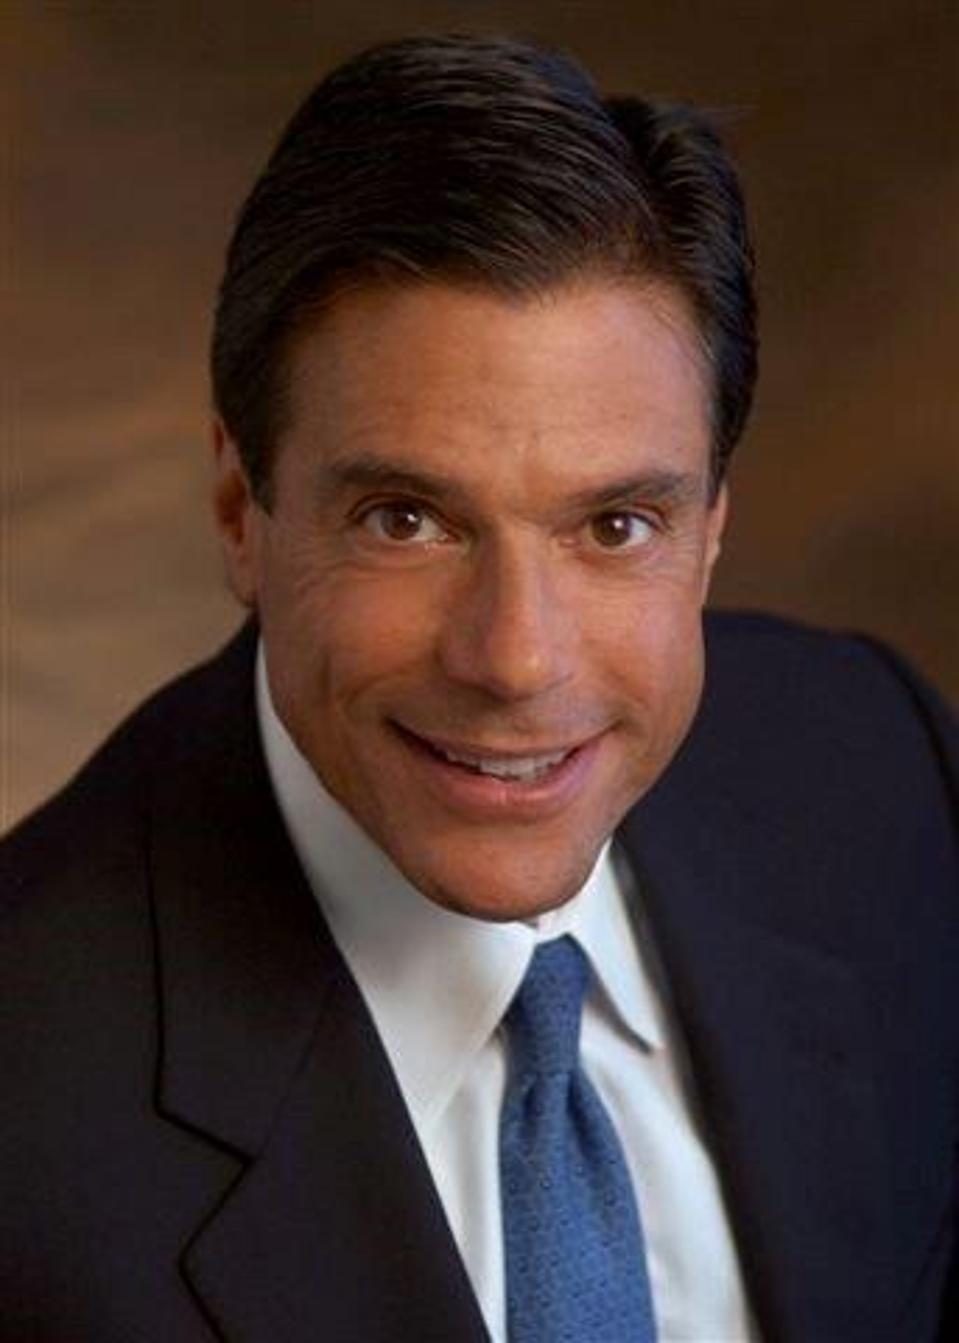 Ira Walker, Managing Director, Senior Portfolio Manager, UBS